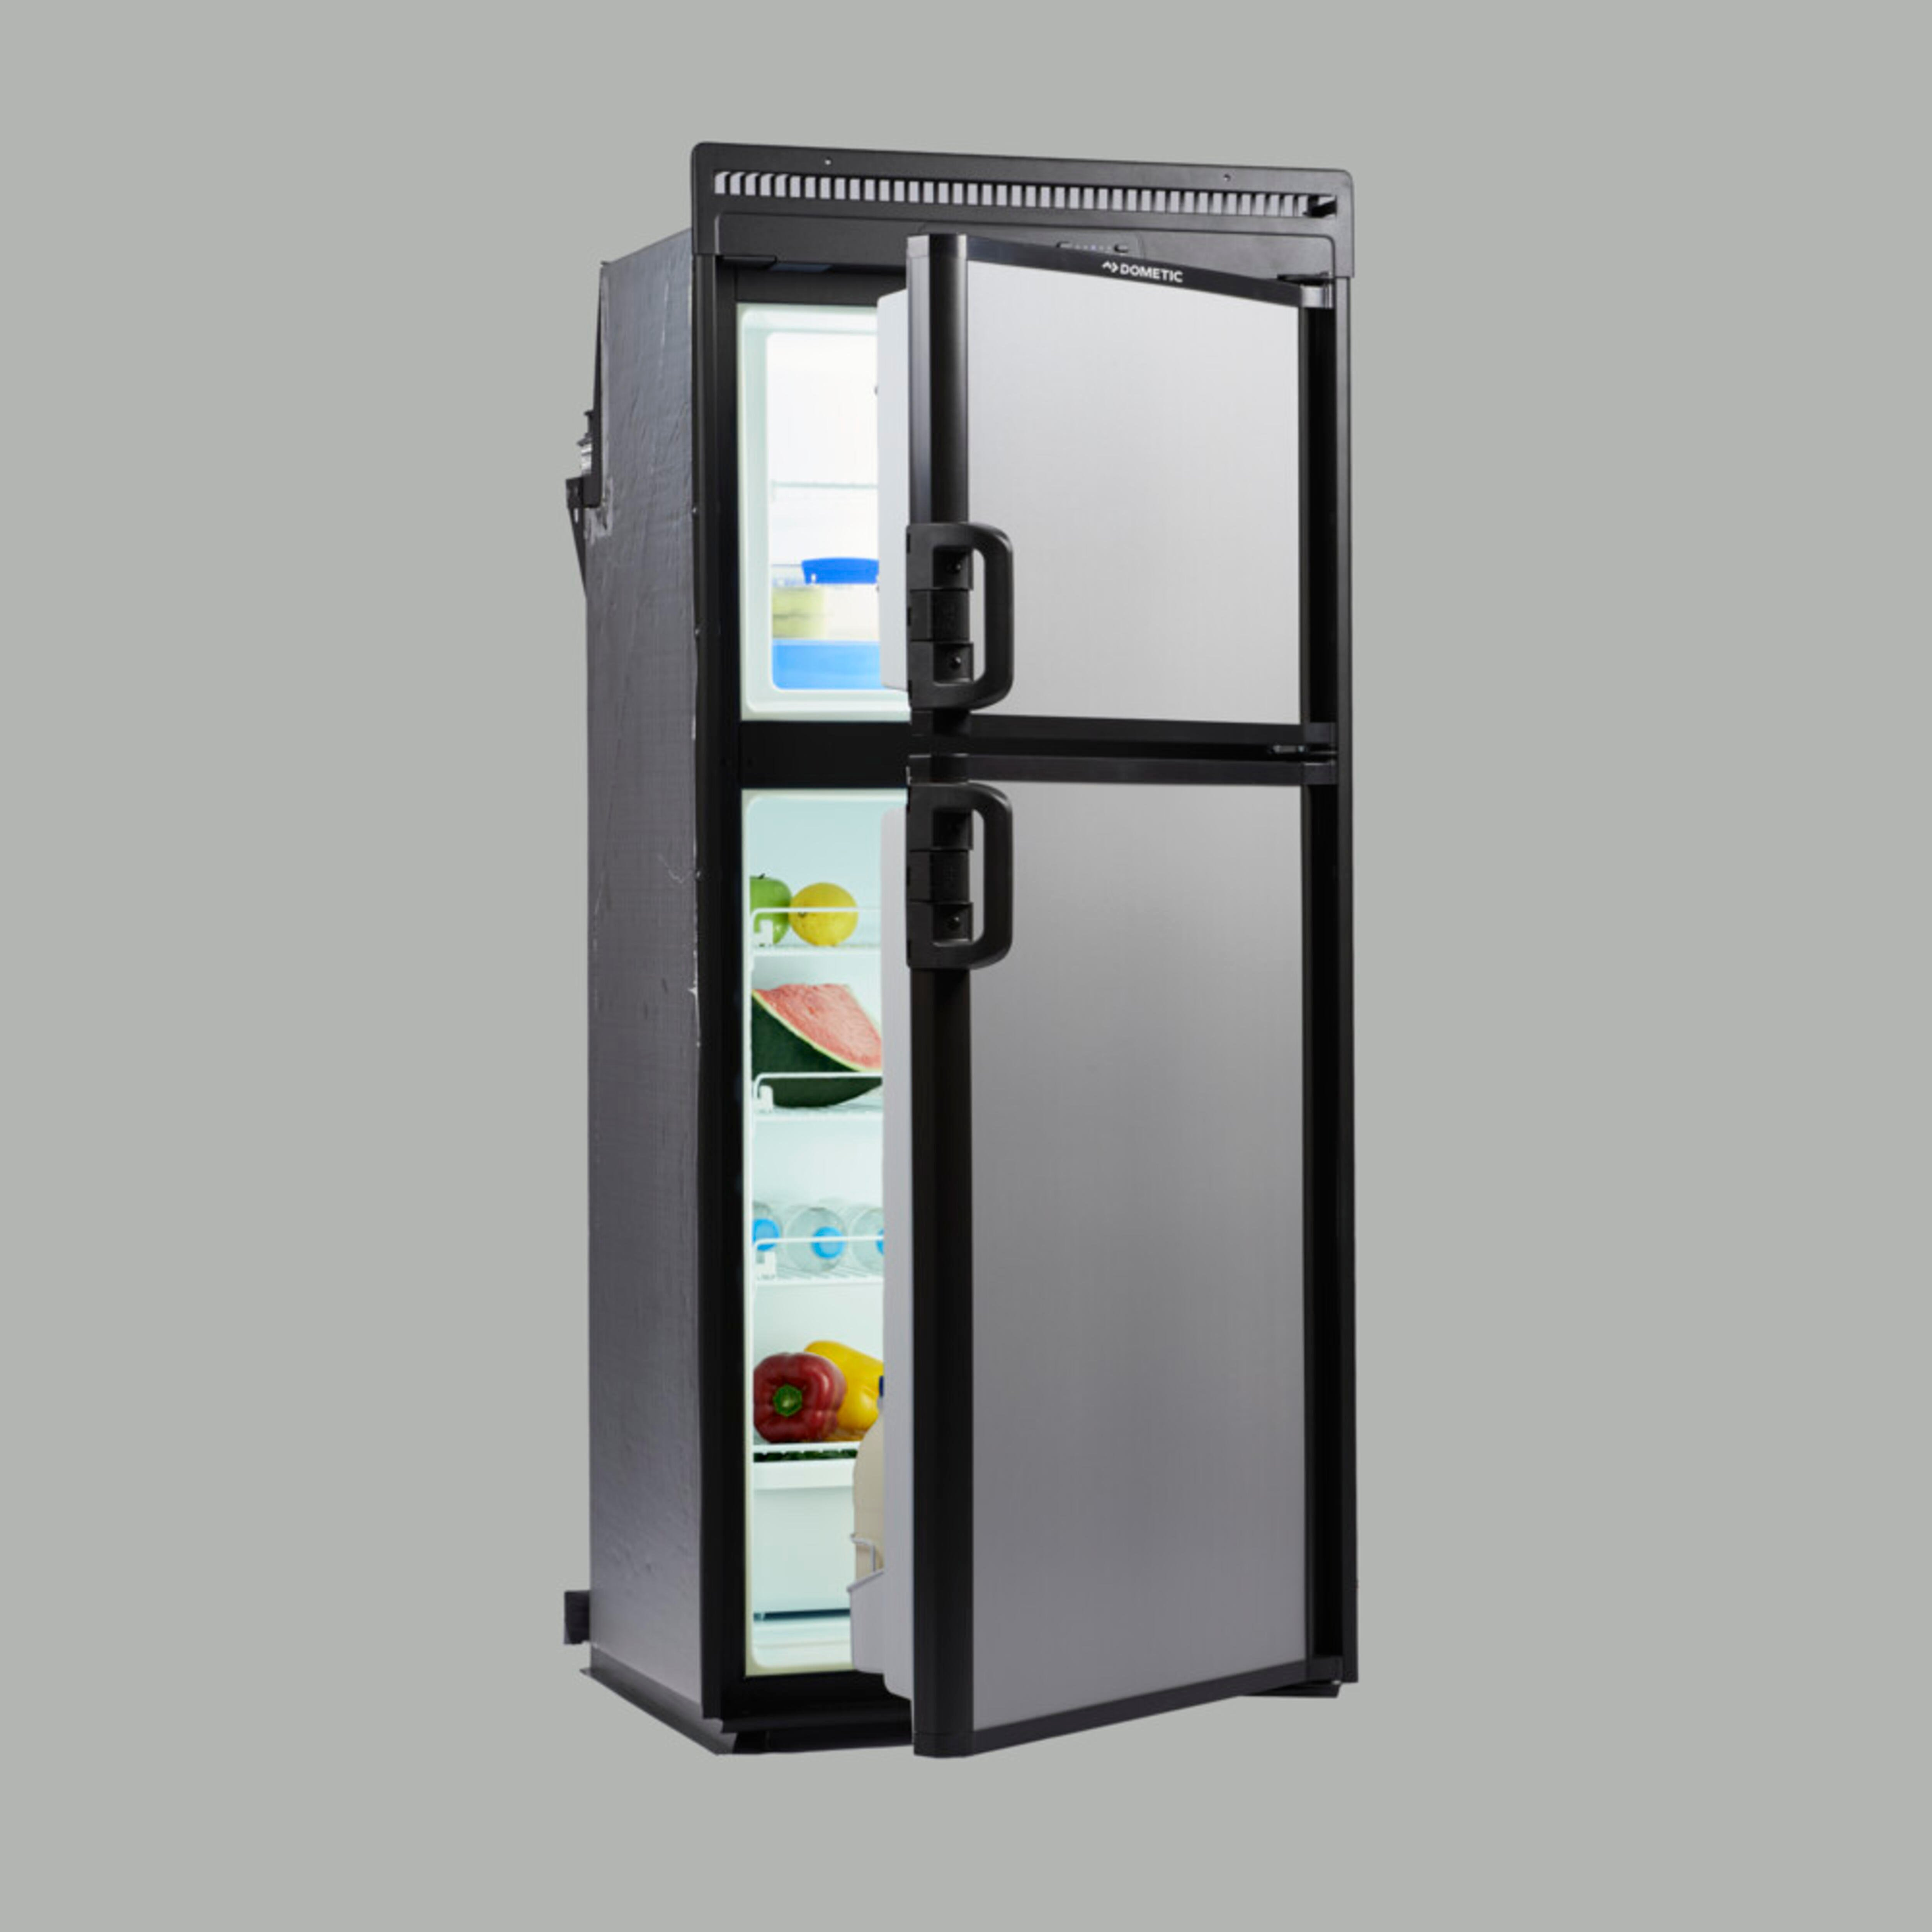 Dometic CoolMatic RPD 190